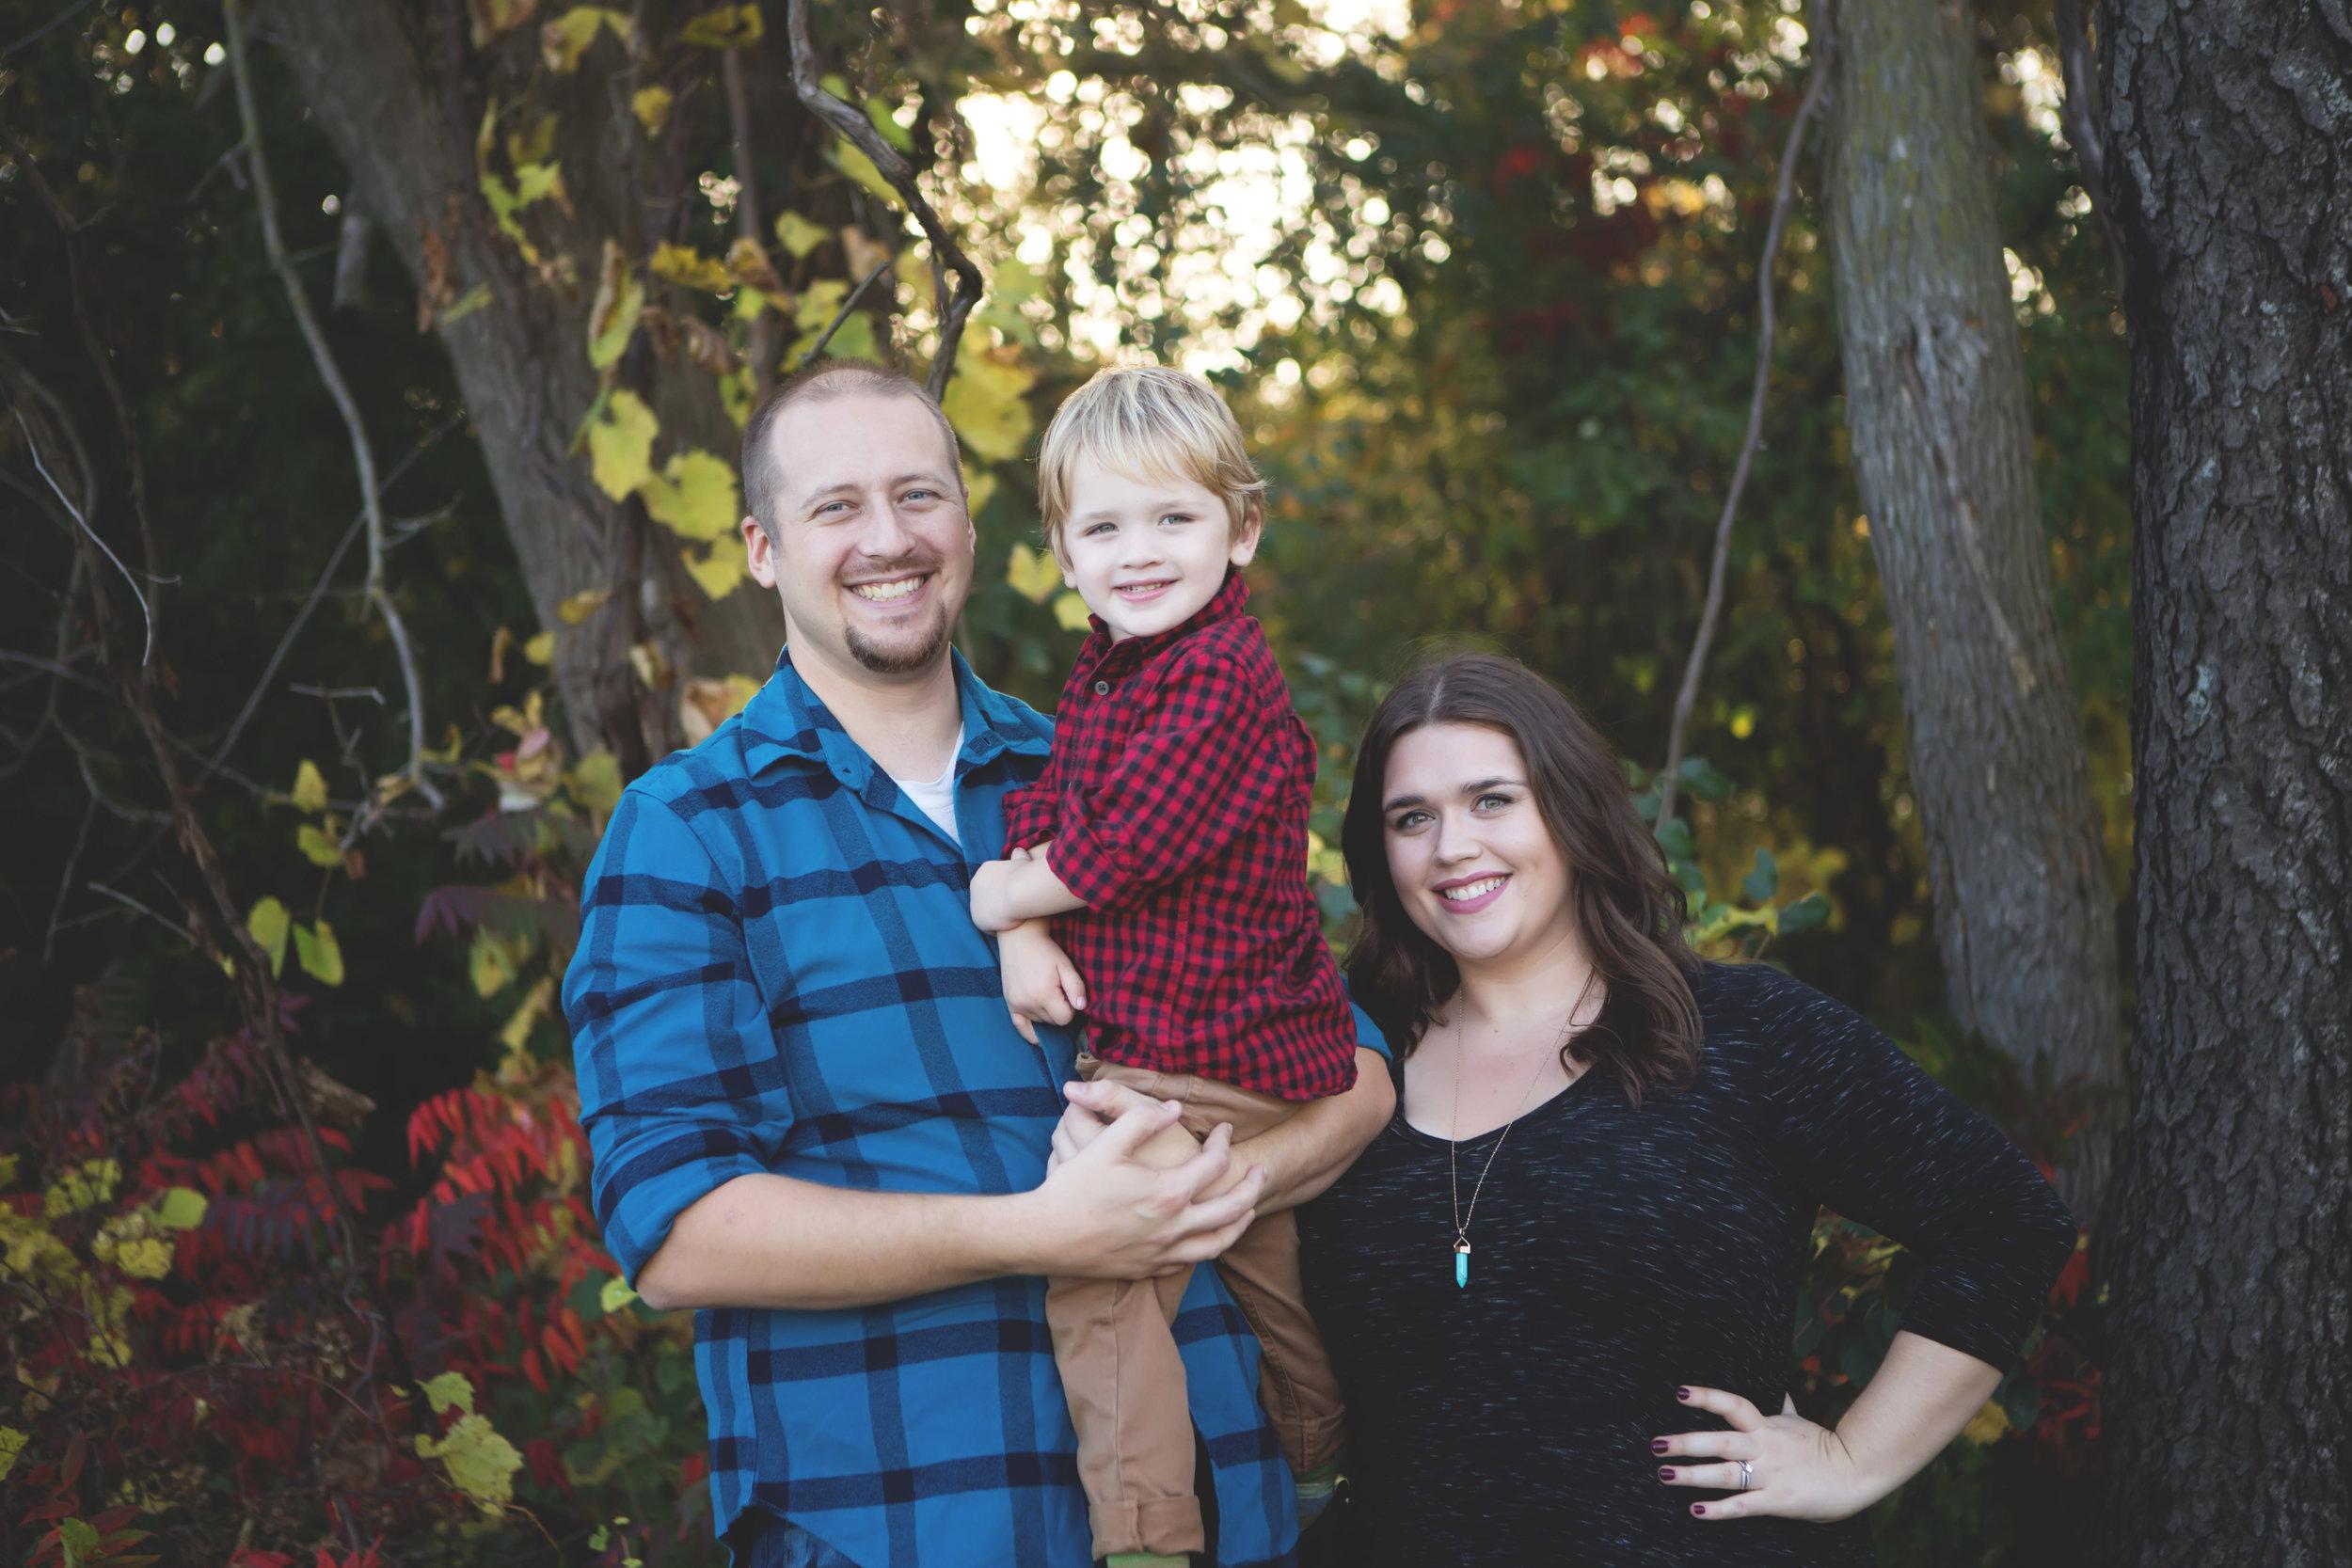 We do annual family photos